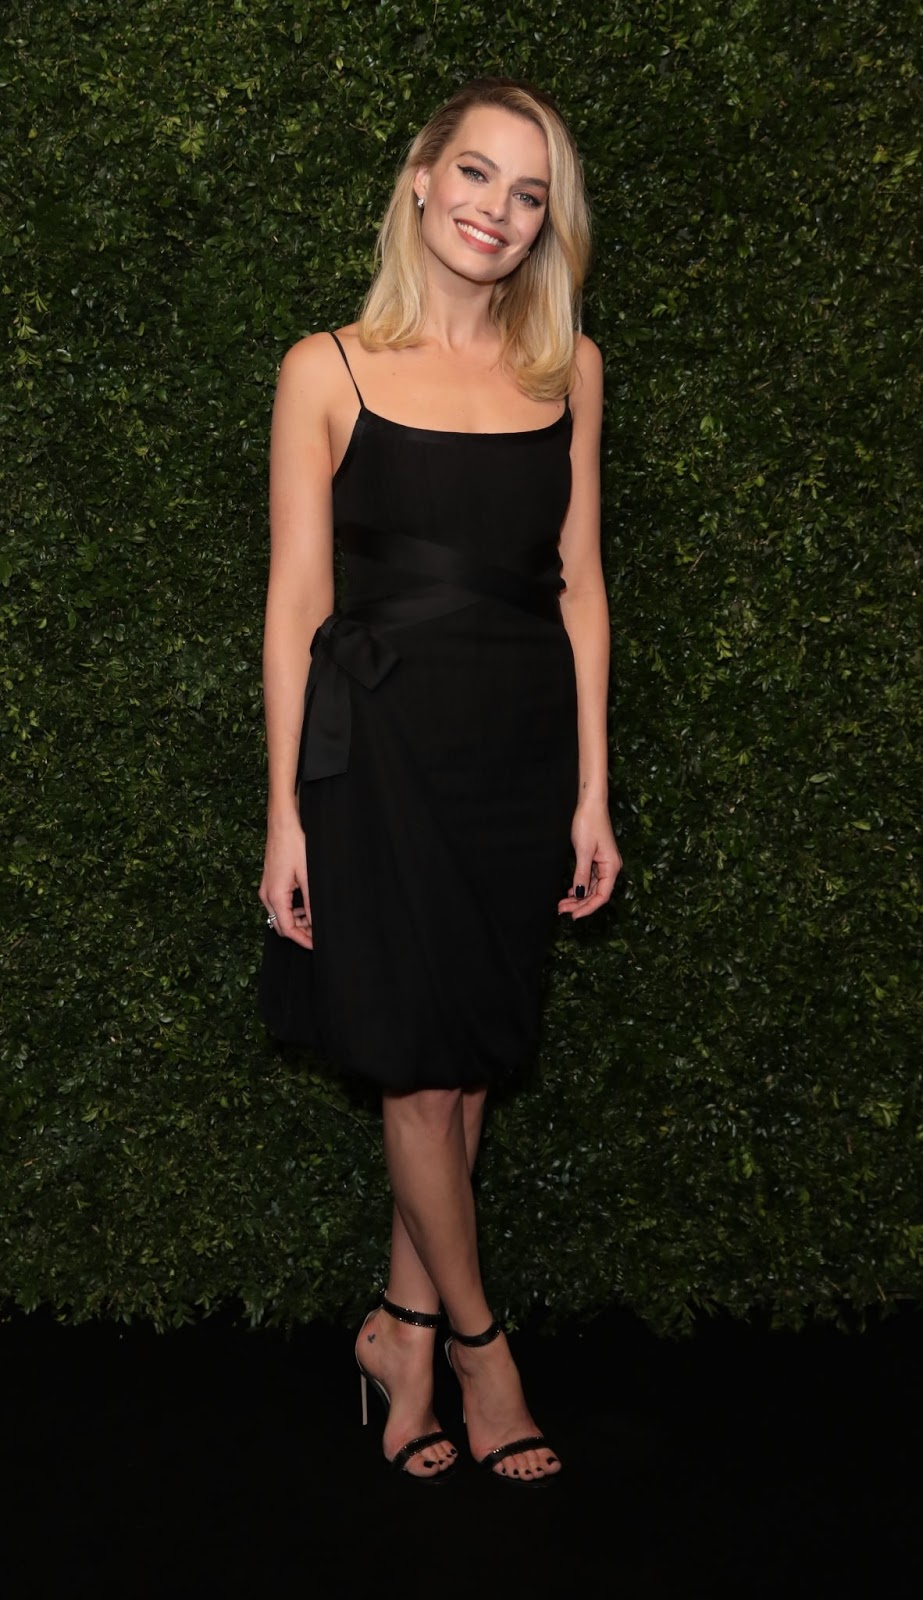 Margot Robbie - Charles Finch pre-Bafta party in London - 02/09/2019